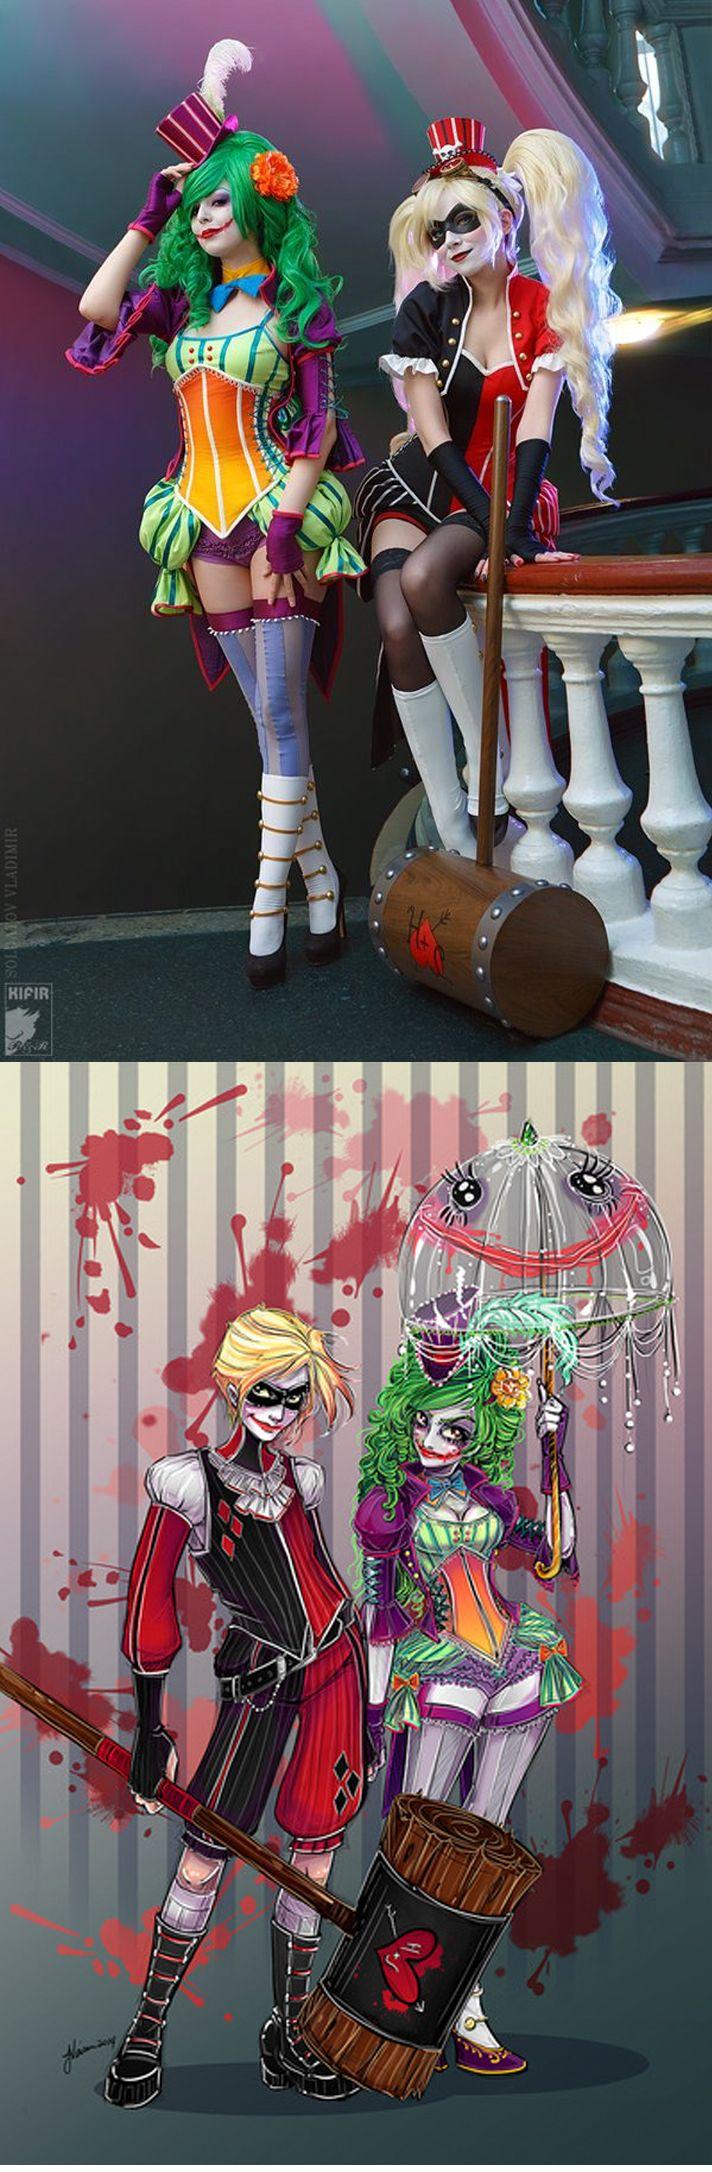 Gorgeous art-inspired Joker & Harley cosplay.  Vibrant Victorian Harley Quinn And Lady Joker Cosplay [Video] | Fashionably Geek